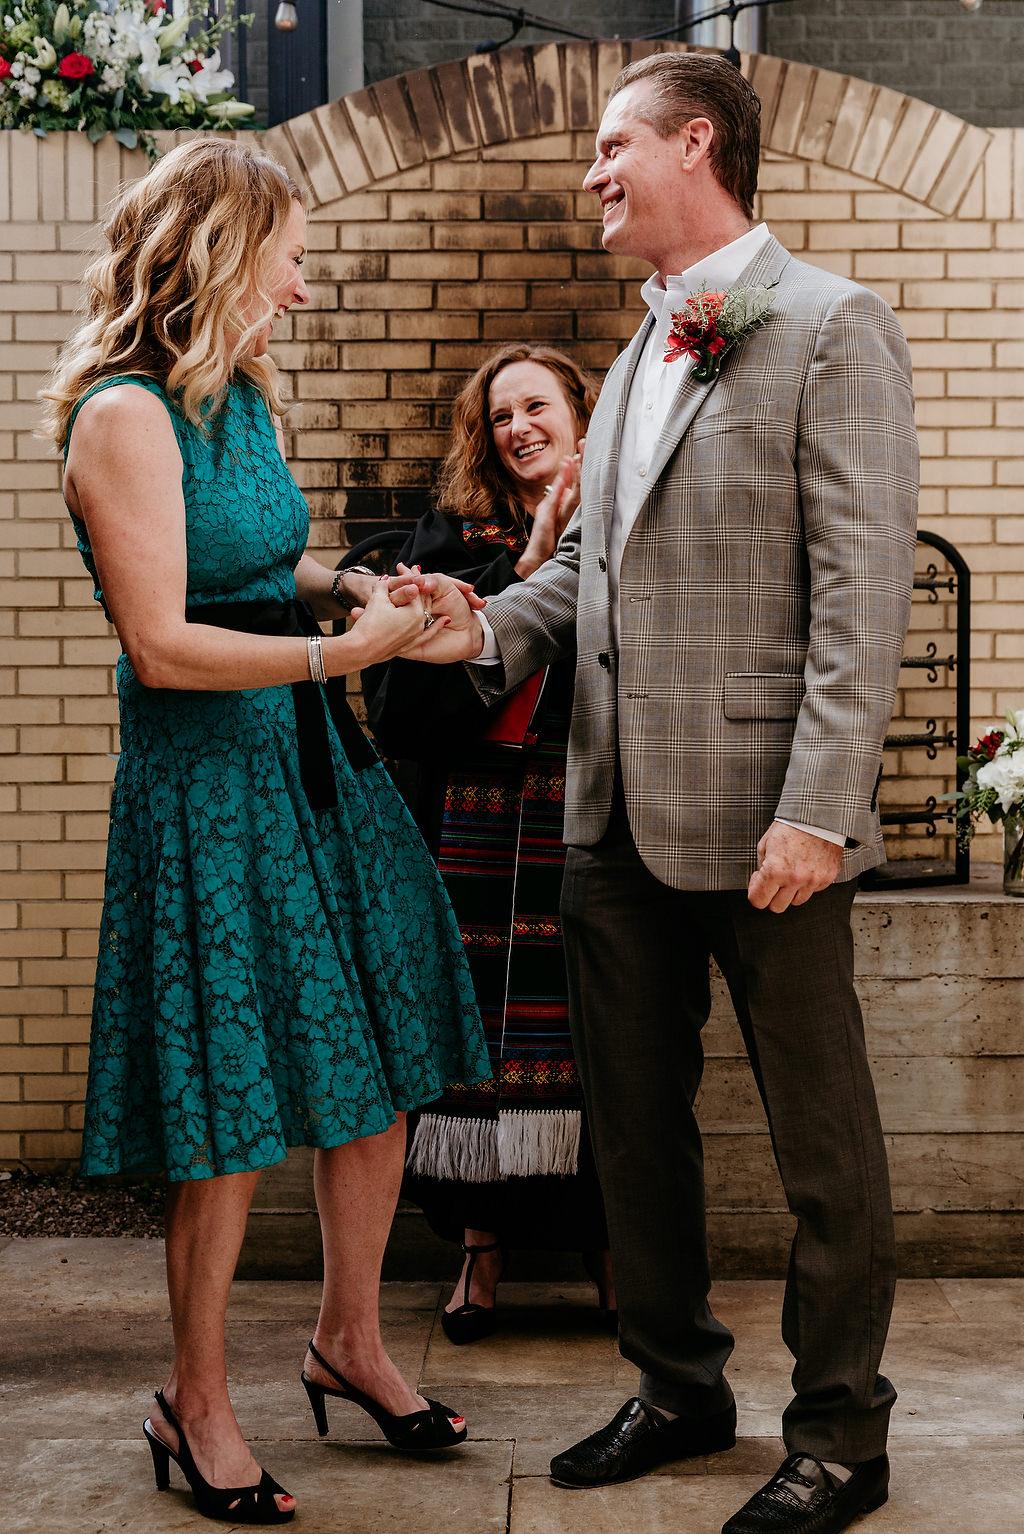 2018-HINGST-WEDDING-073-ANINDOORLADY